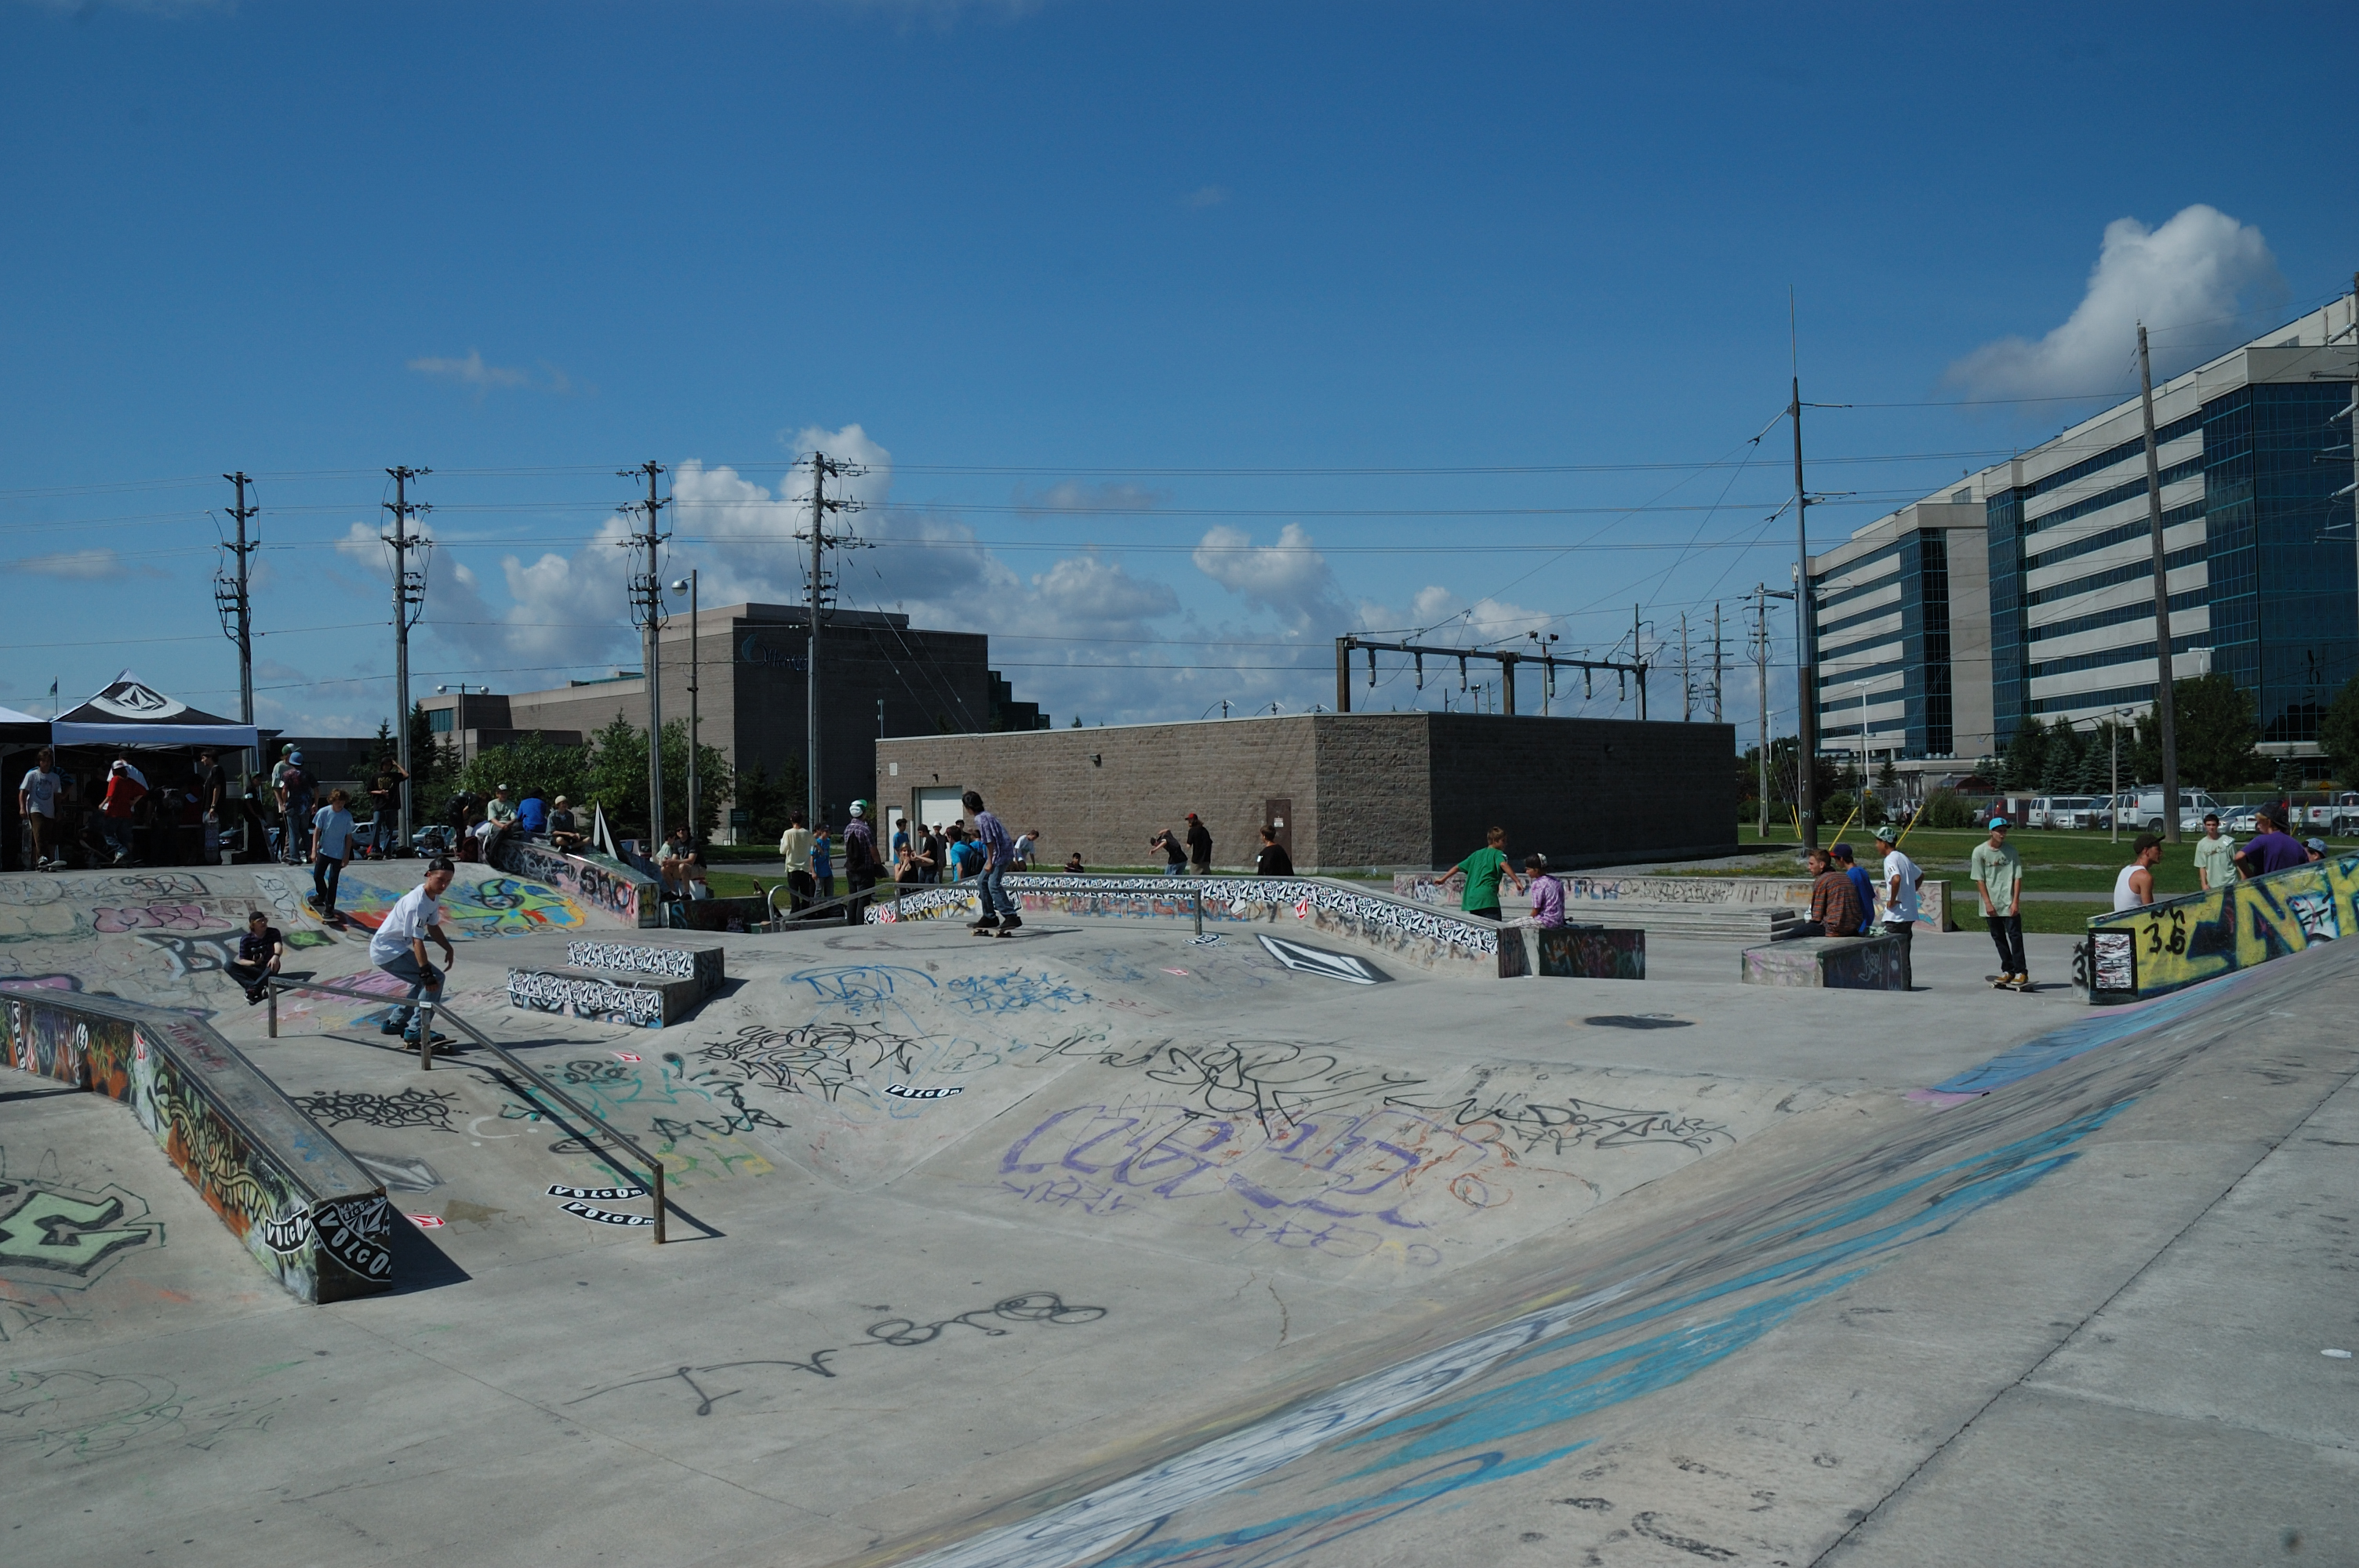 Legacy Skatepark